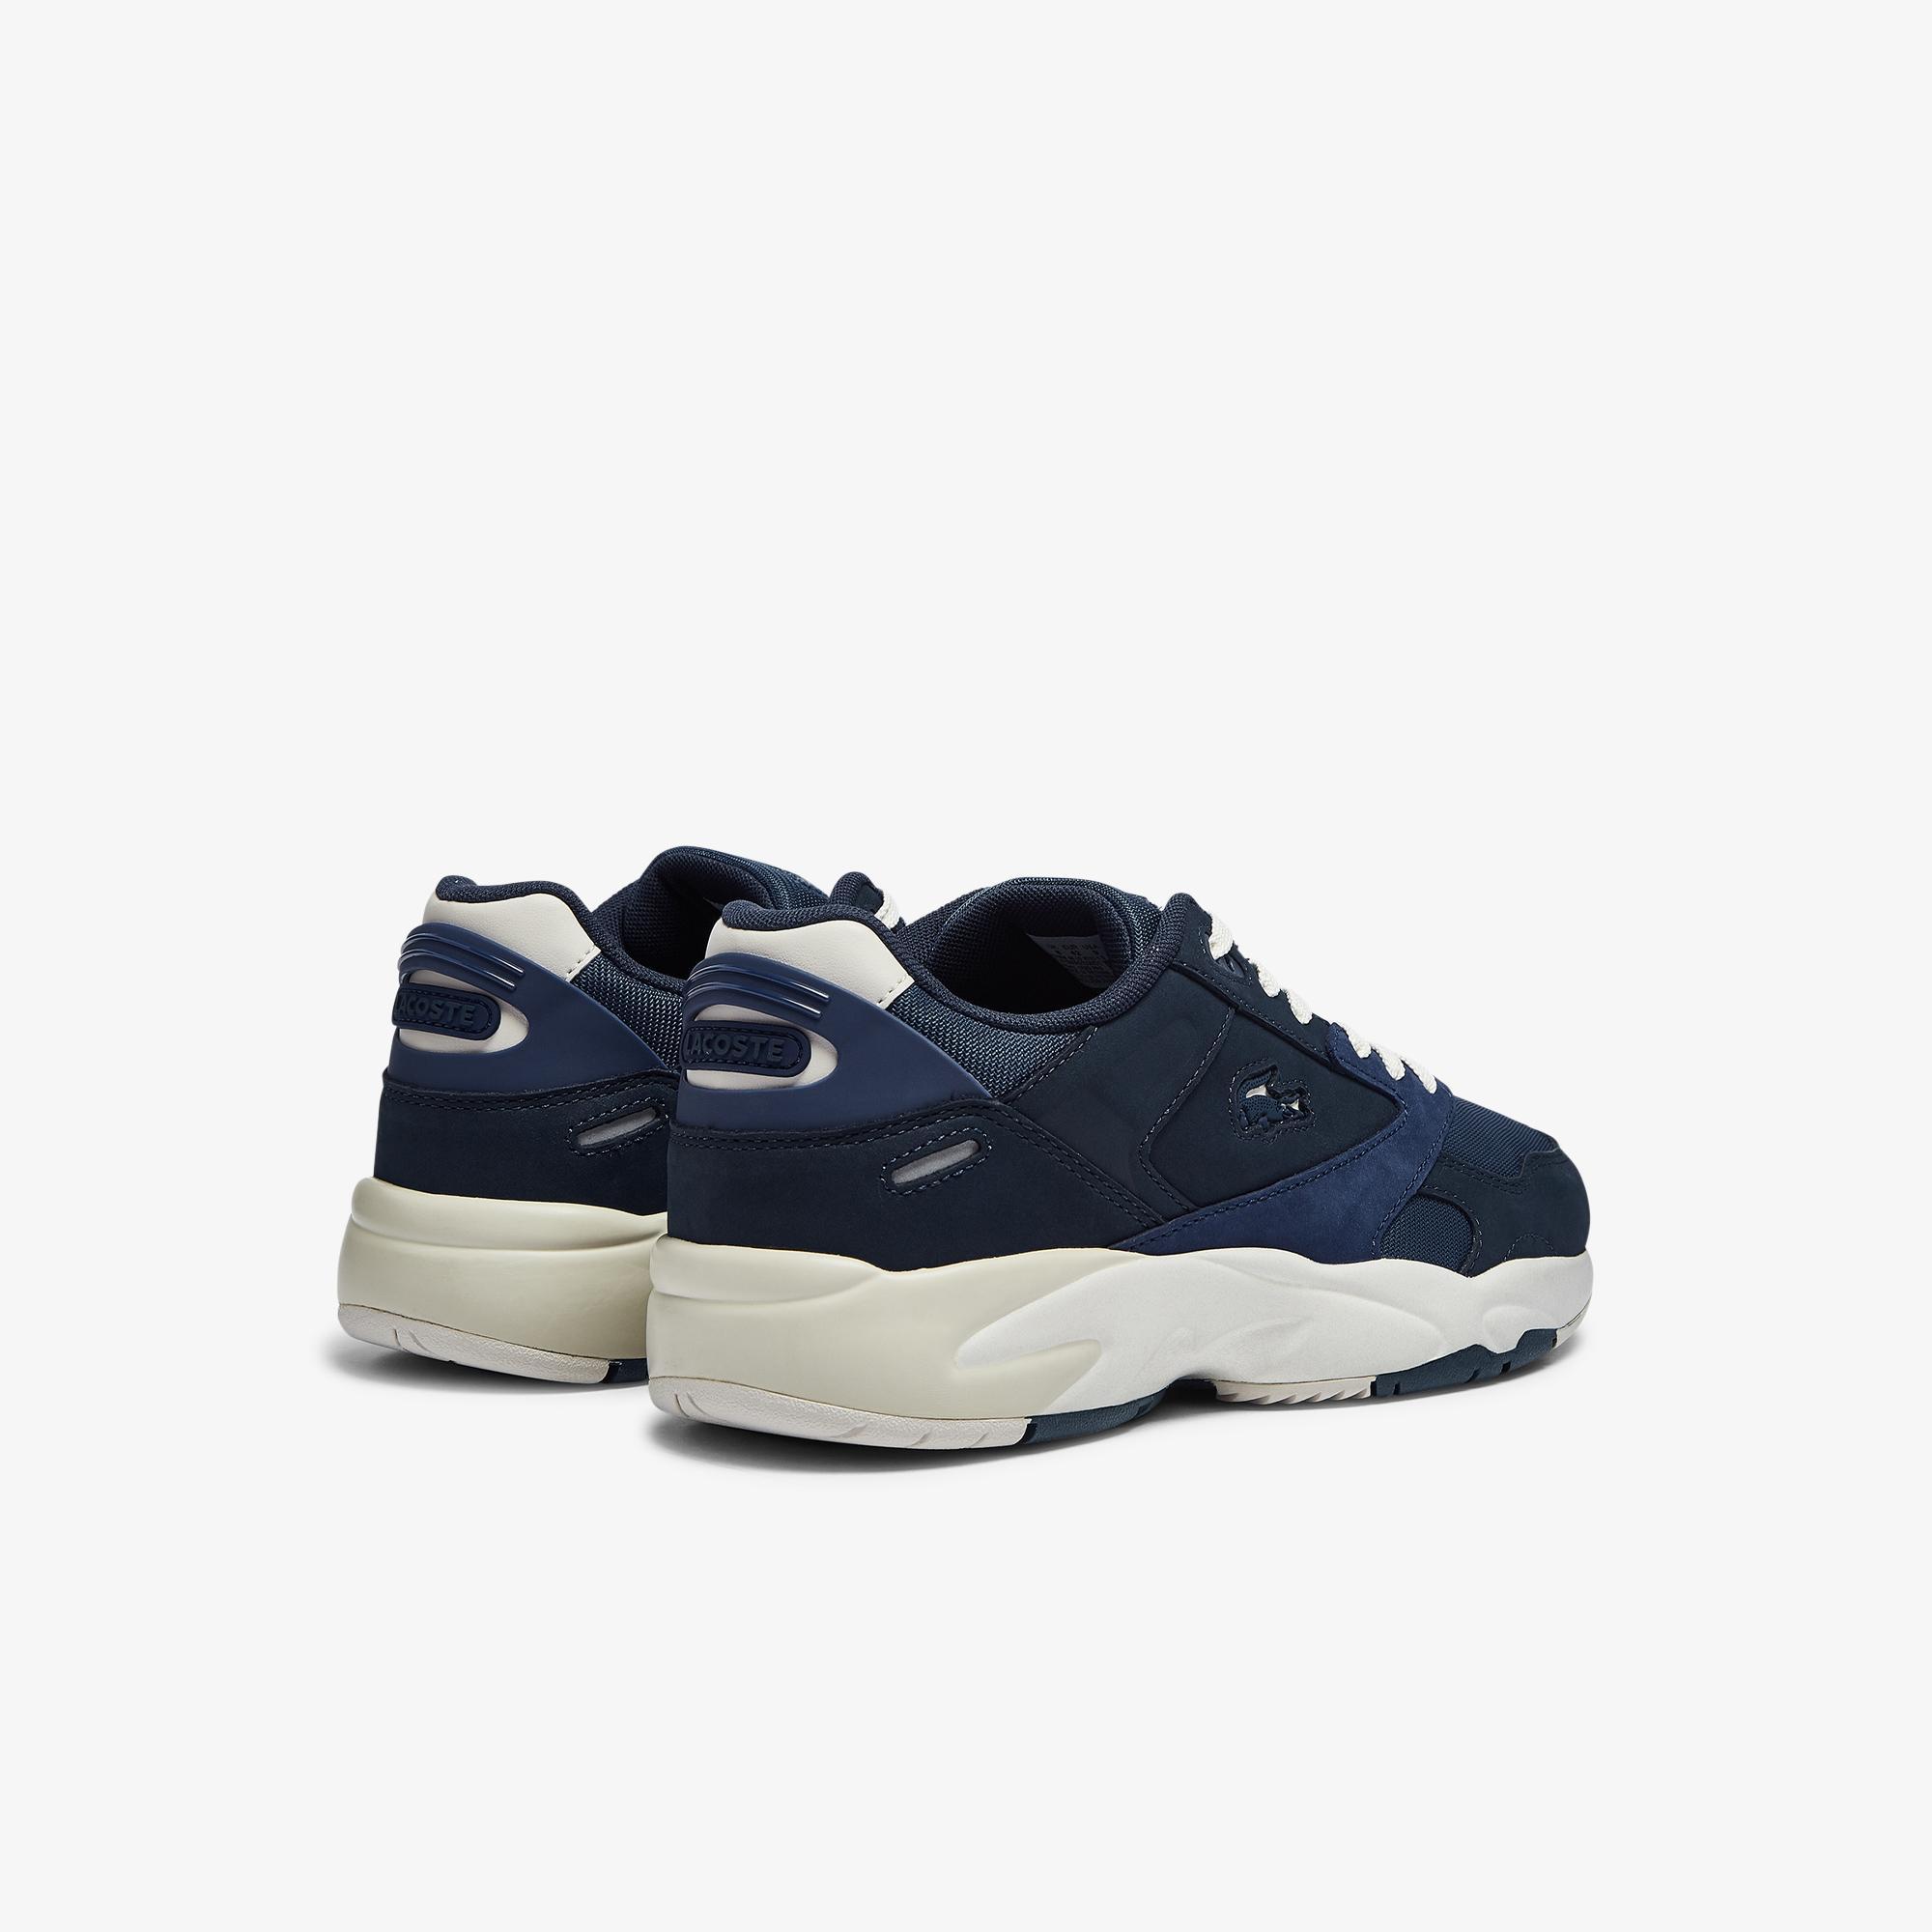 Lacoste Storm 96 Lo 0721 1 G Sma Erkek Lacivert - Mavi Sneaker